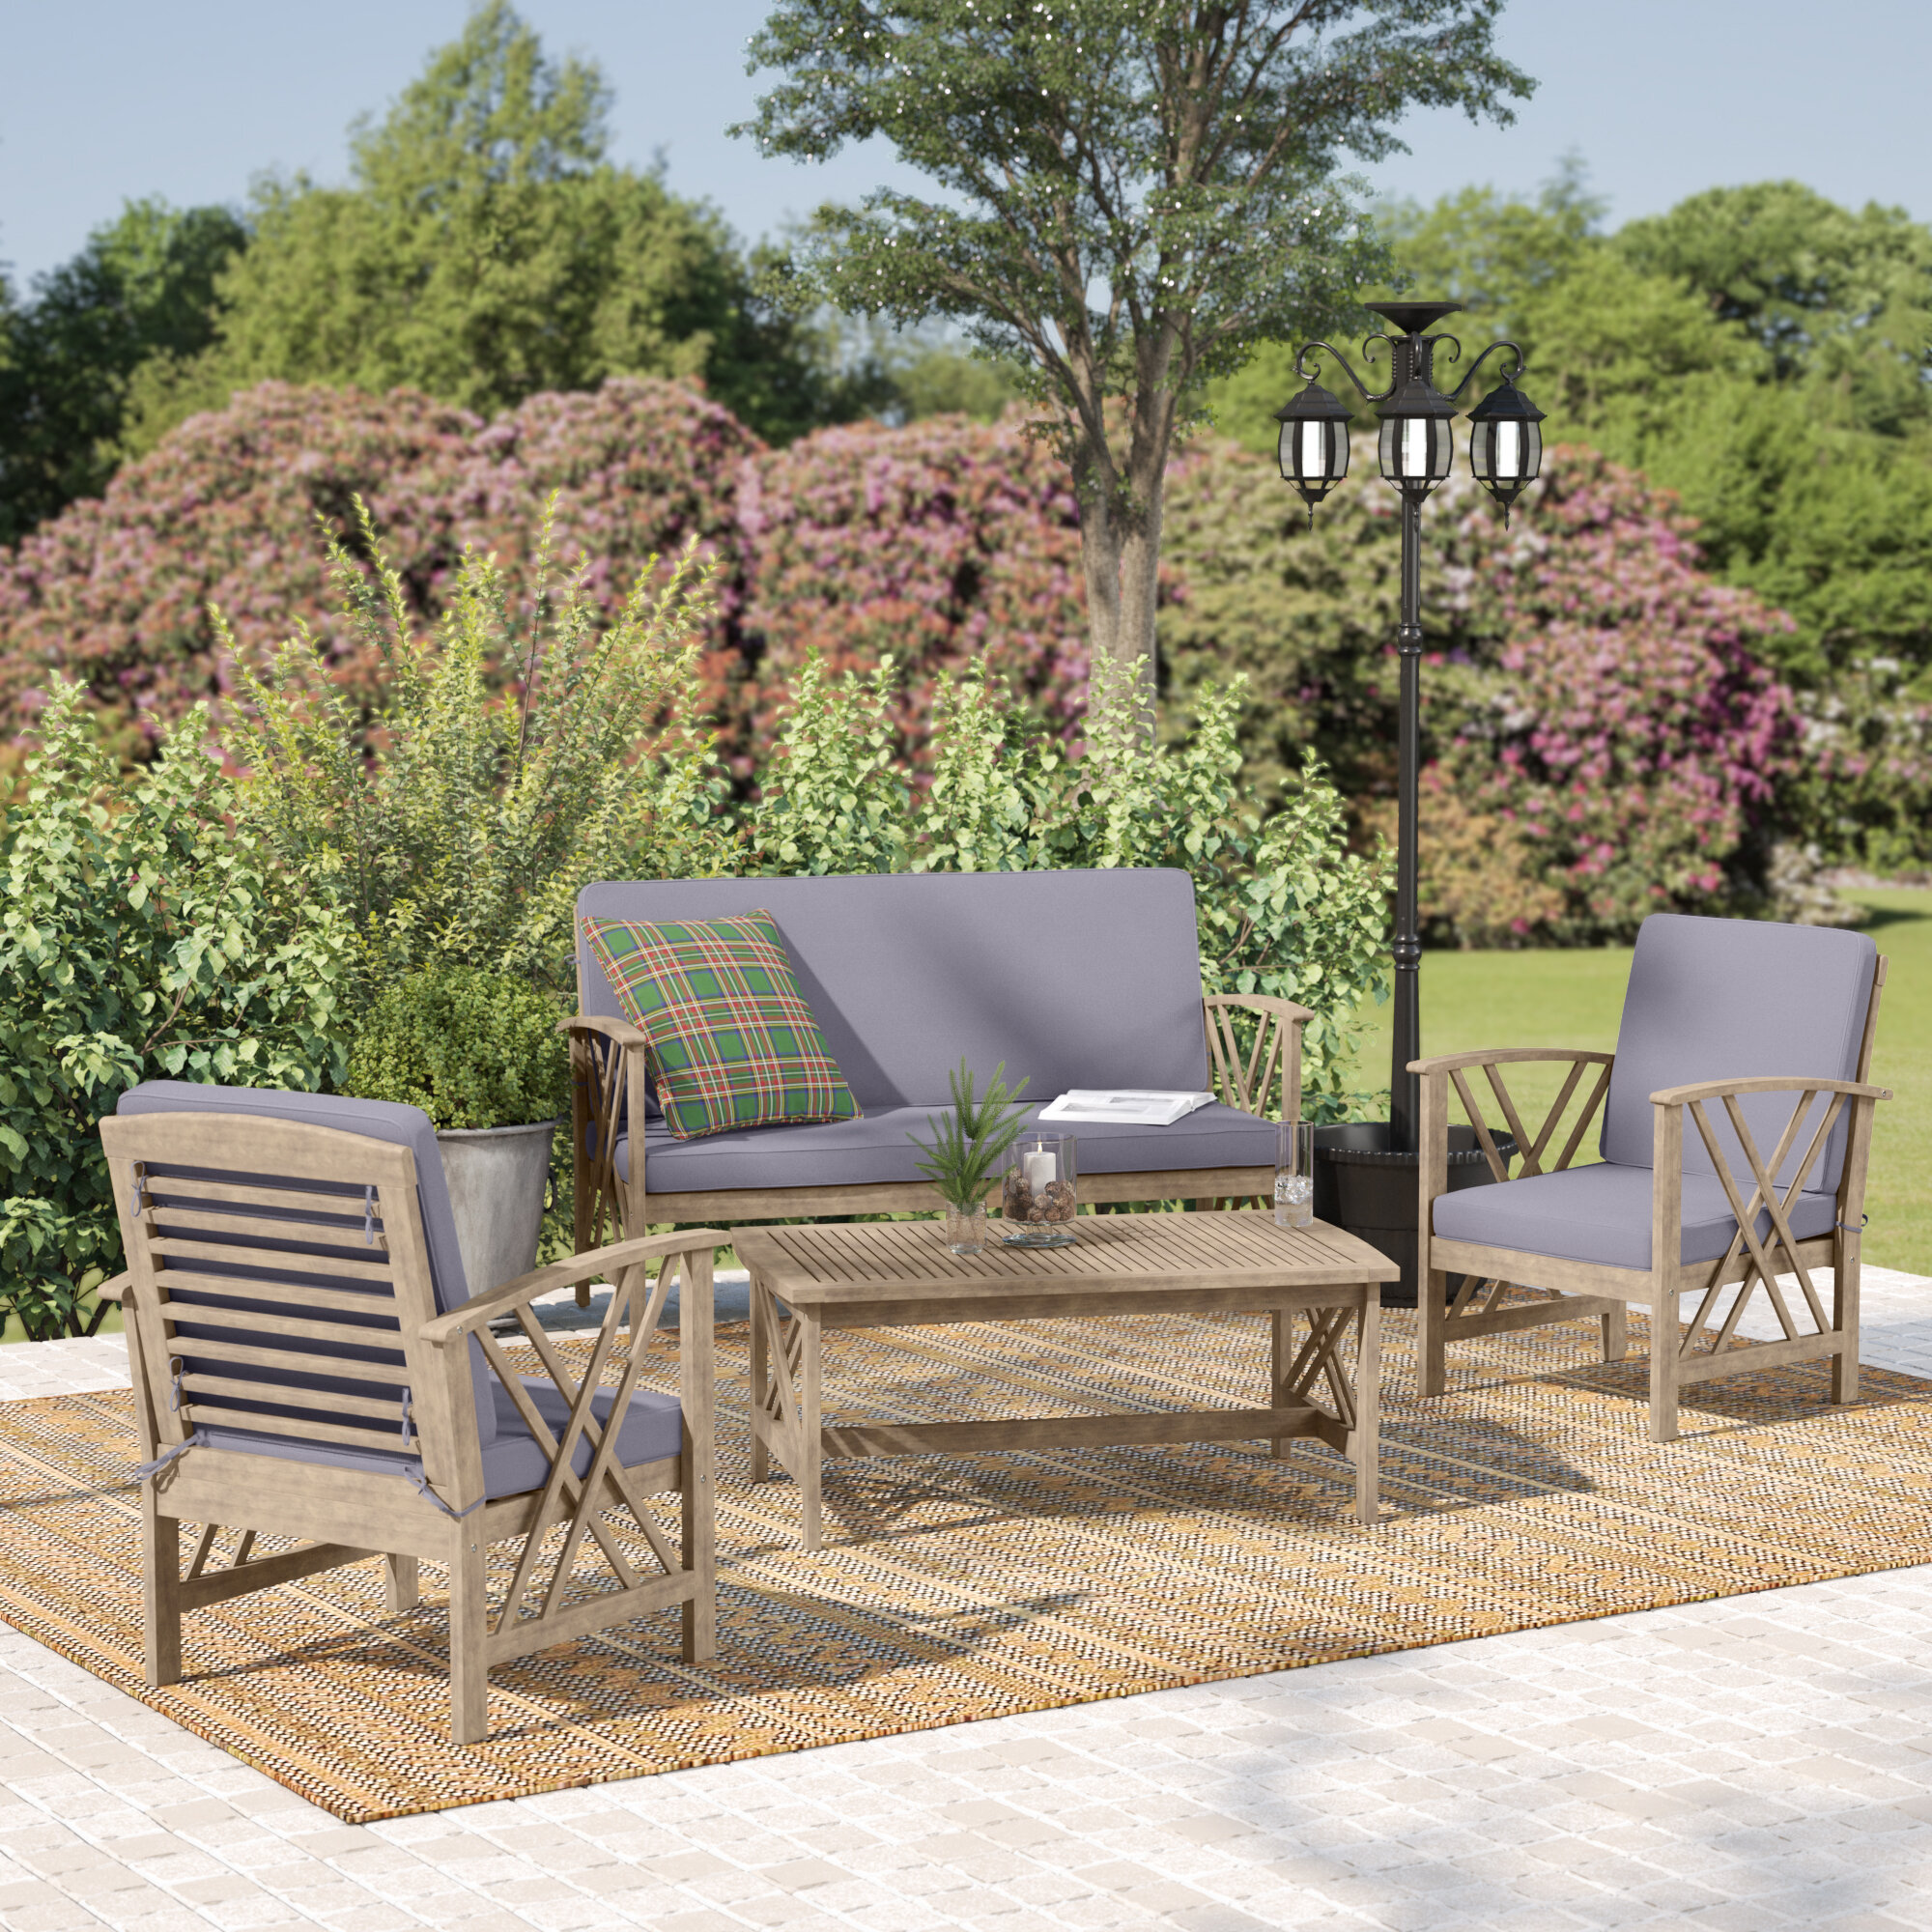 Mistana morgan 4 piece sofe seating group with cushions reviews wayfair